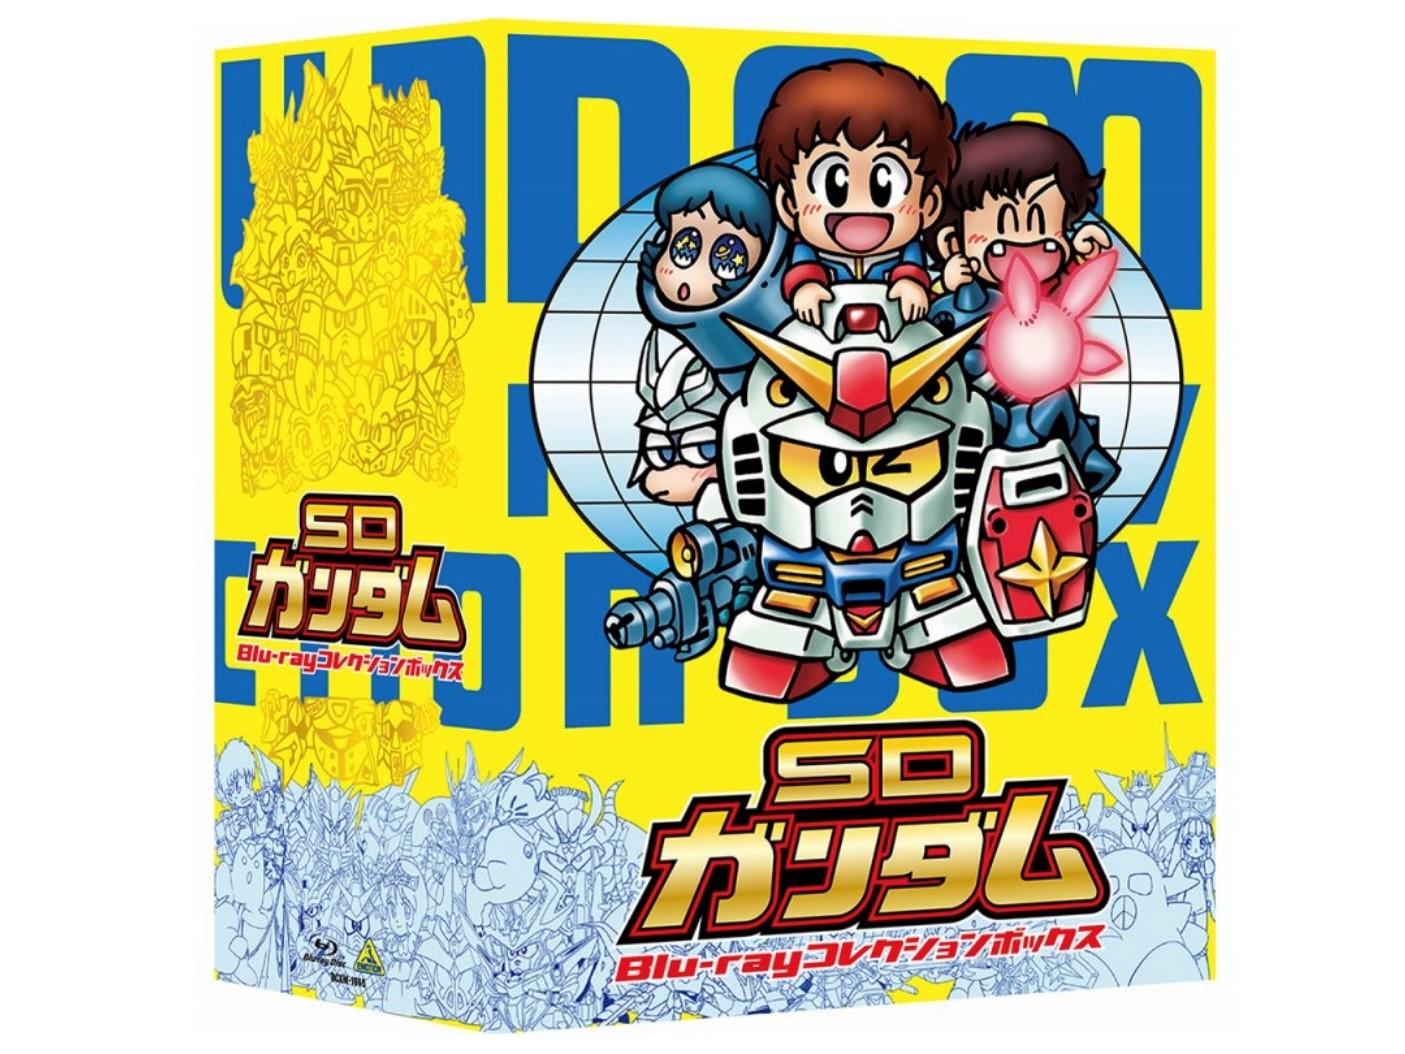 SDガンダム Blu-ray コレクションボックス(特装限定版)